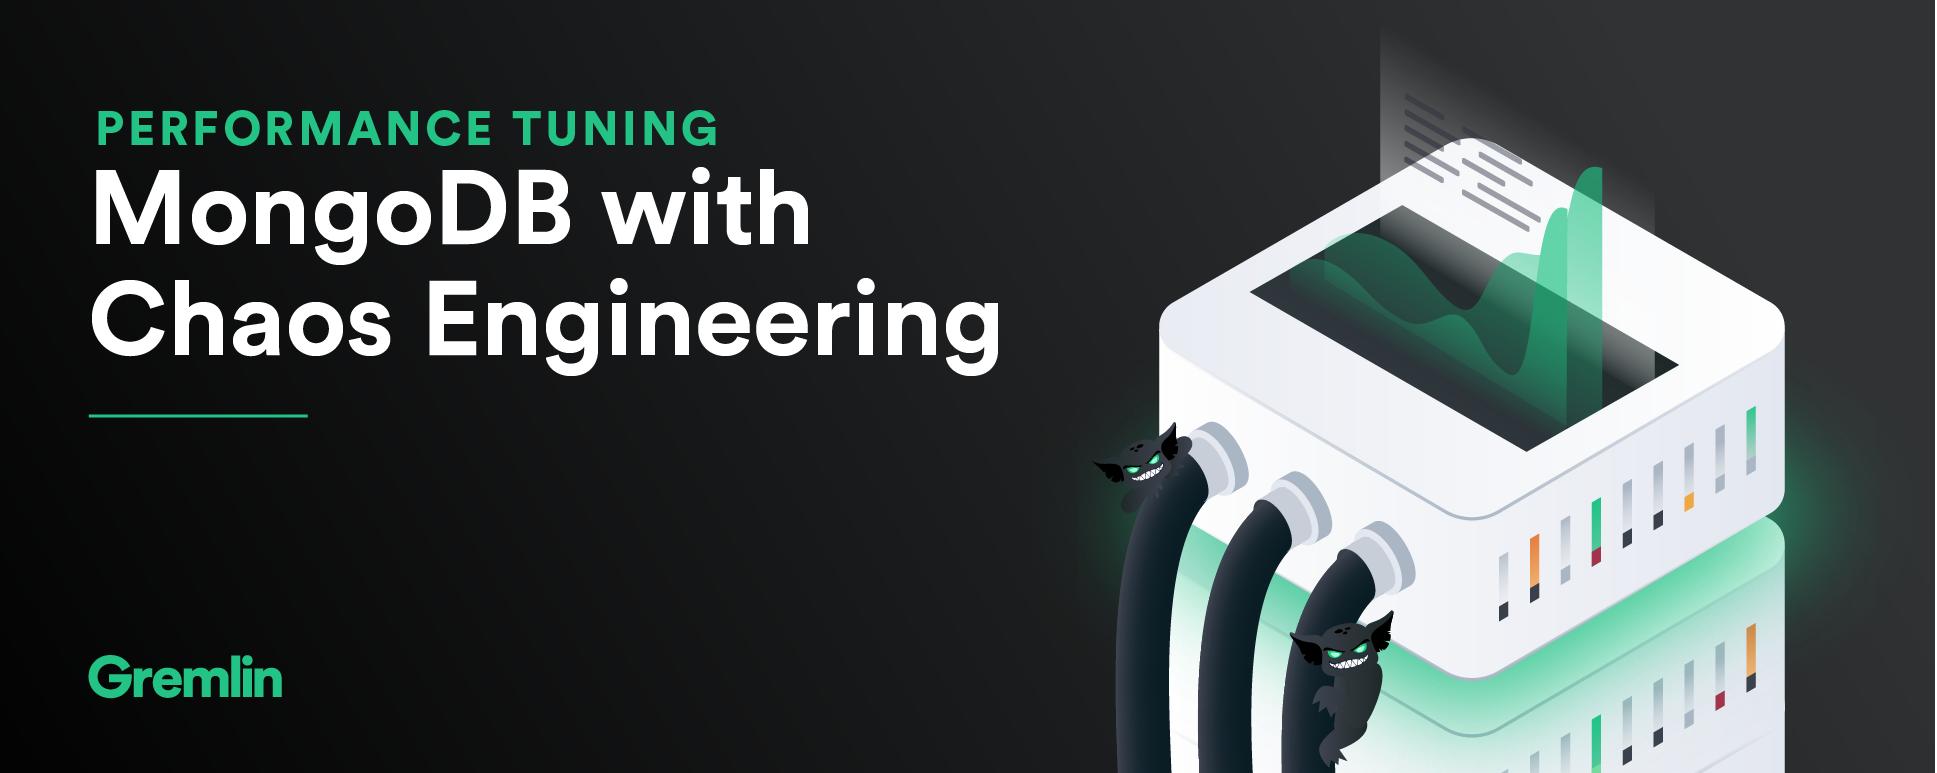 Performance tuning MongoDB with Chaos Engineering